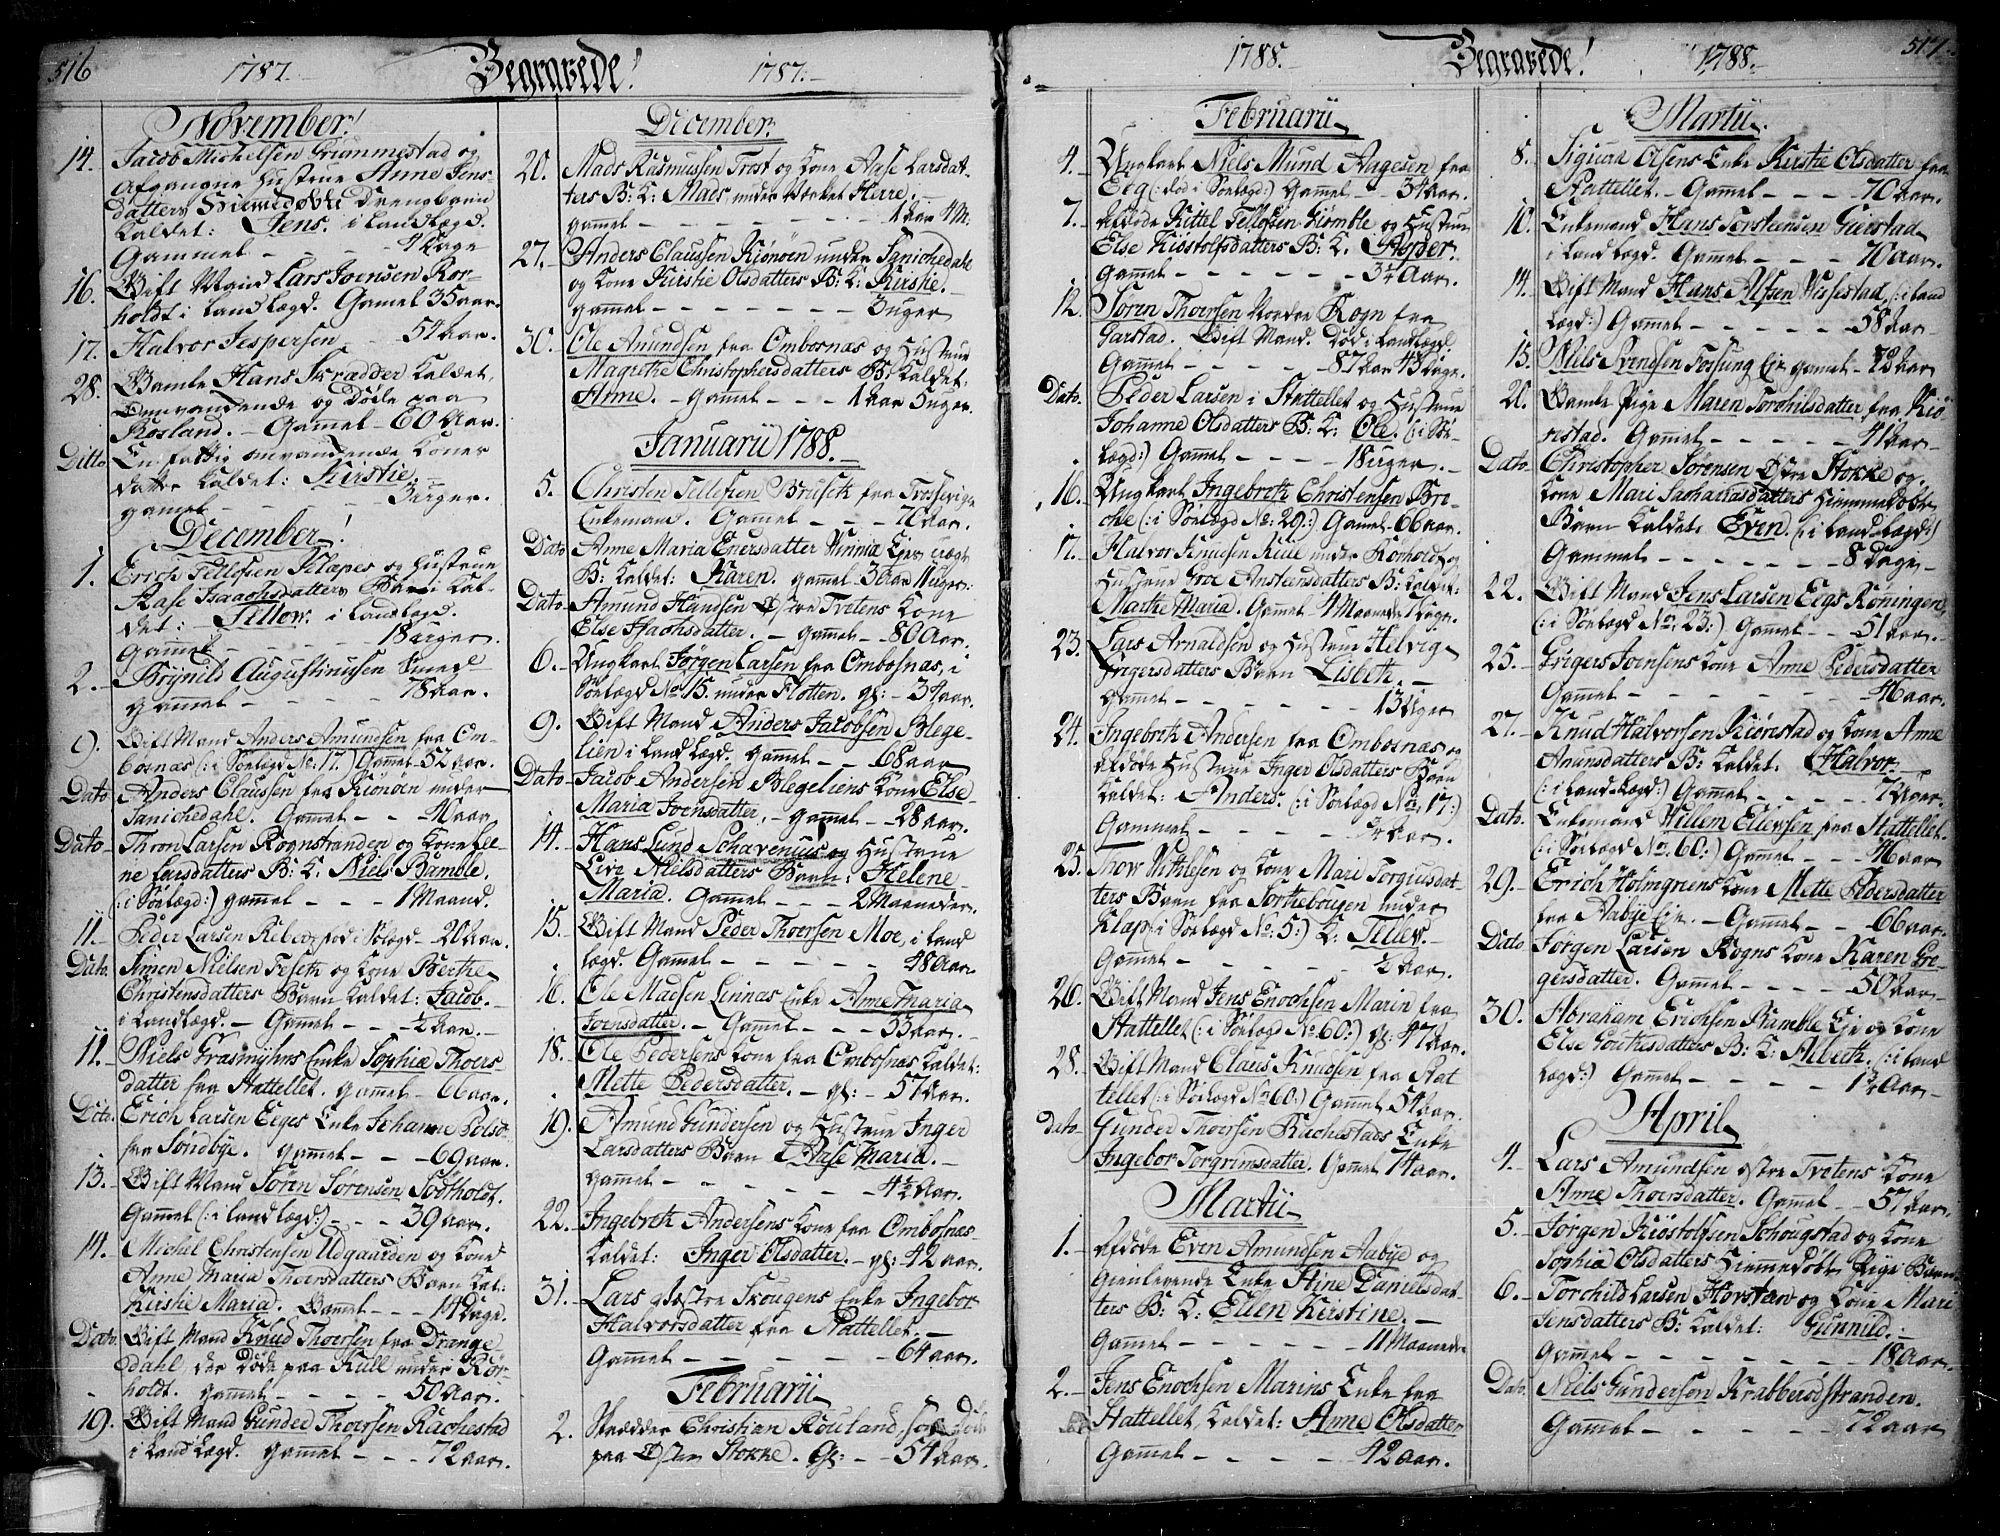 SAKO, Bamble kirkebøker, F/Fa/L0002: Ministerialbok nr. I 2, 1775-1814, s. 516-517